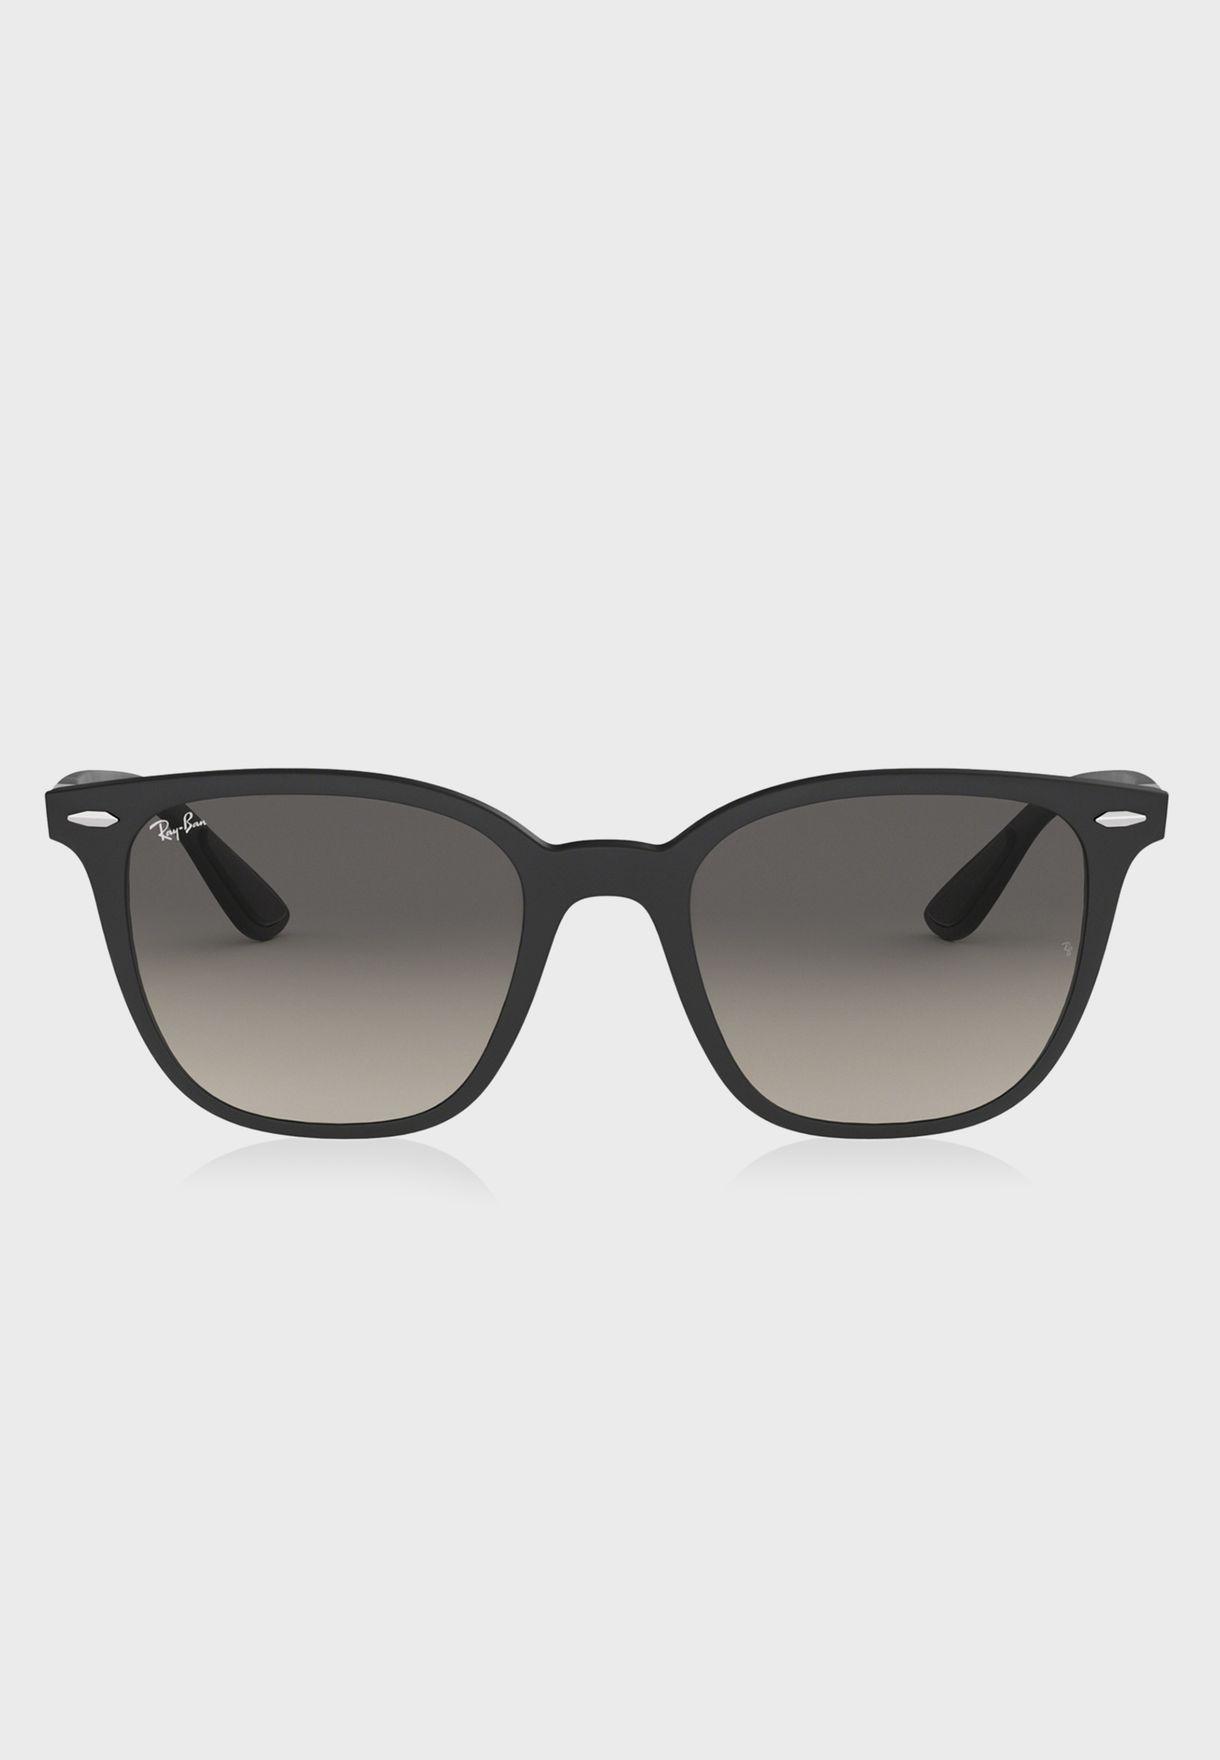 489191c4d7 Shop Ray-Ban black 0RB4297 Wayfarer Sunglasses 8053672869590 for Men ...